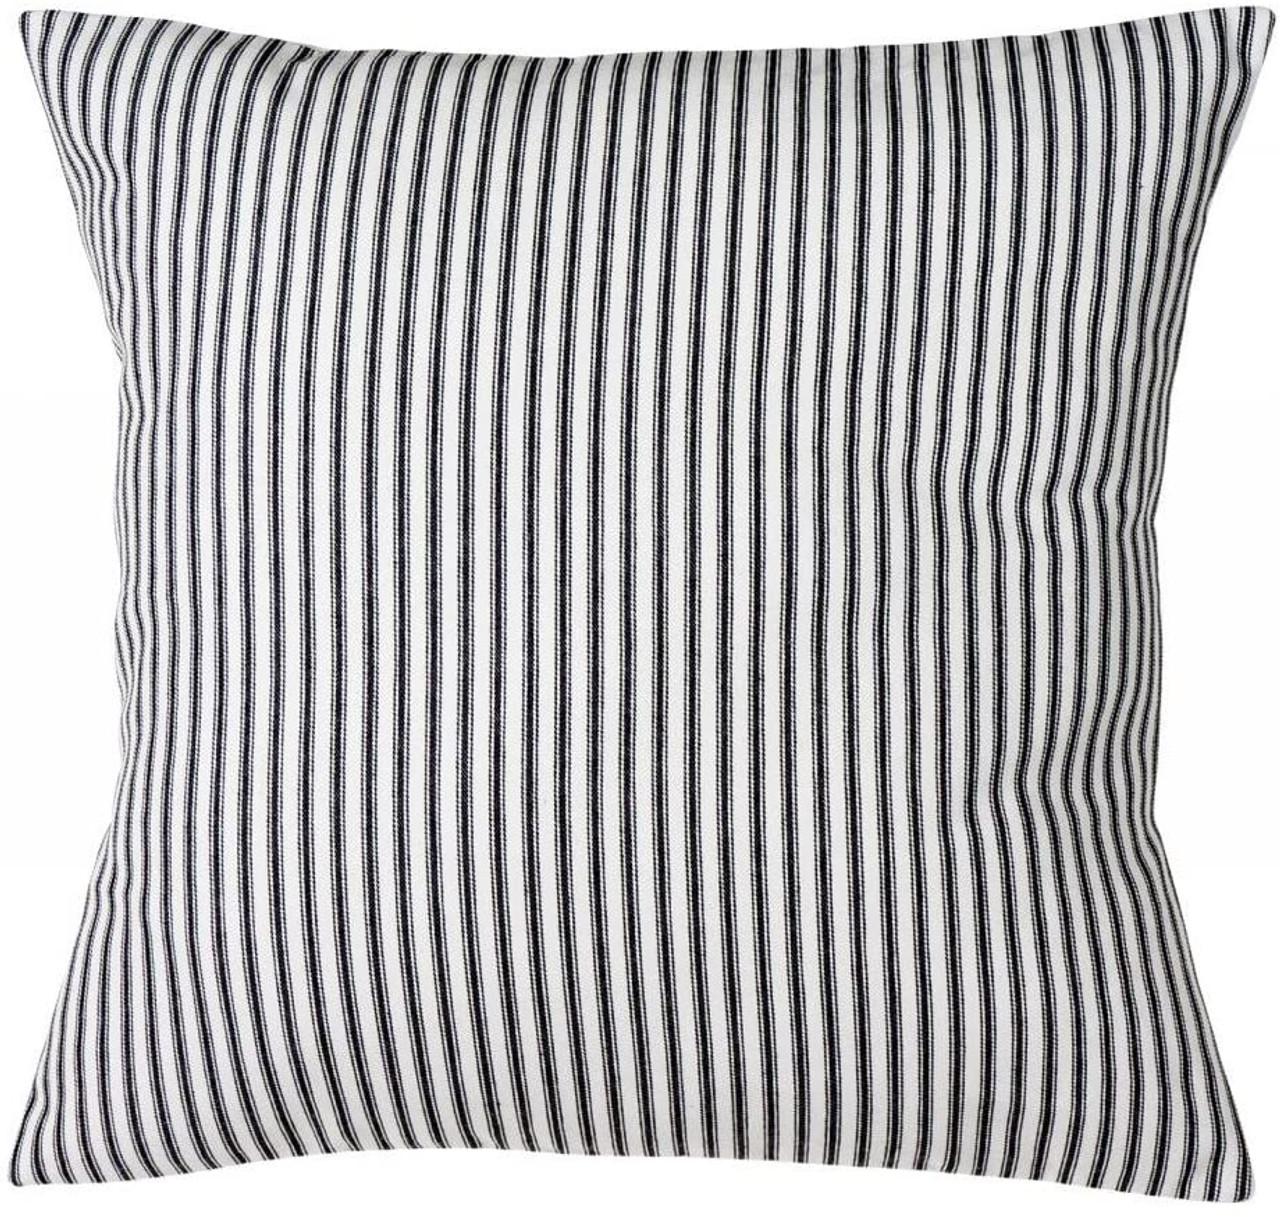 "Pillow Covers Pillow Shams Black and White Beach Pillows Decorative Throw Pillows 18"" Striped"